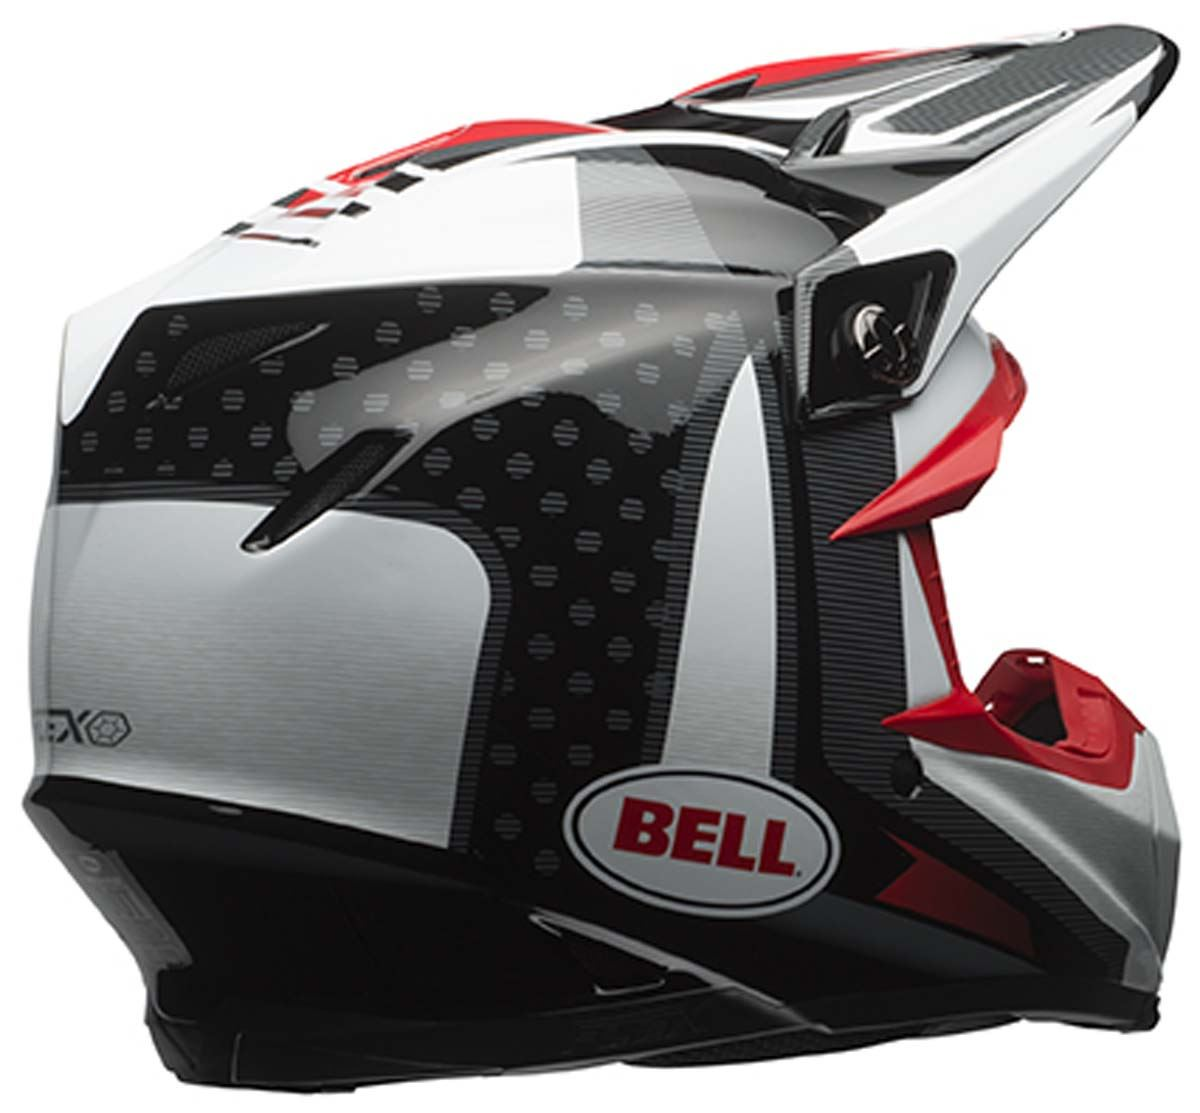 bell moto 9 helmet carbon flex off road mx dirt bike snell m2015 dot. Black Bedroom Furniture Sets. Home Design Ideas